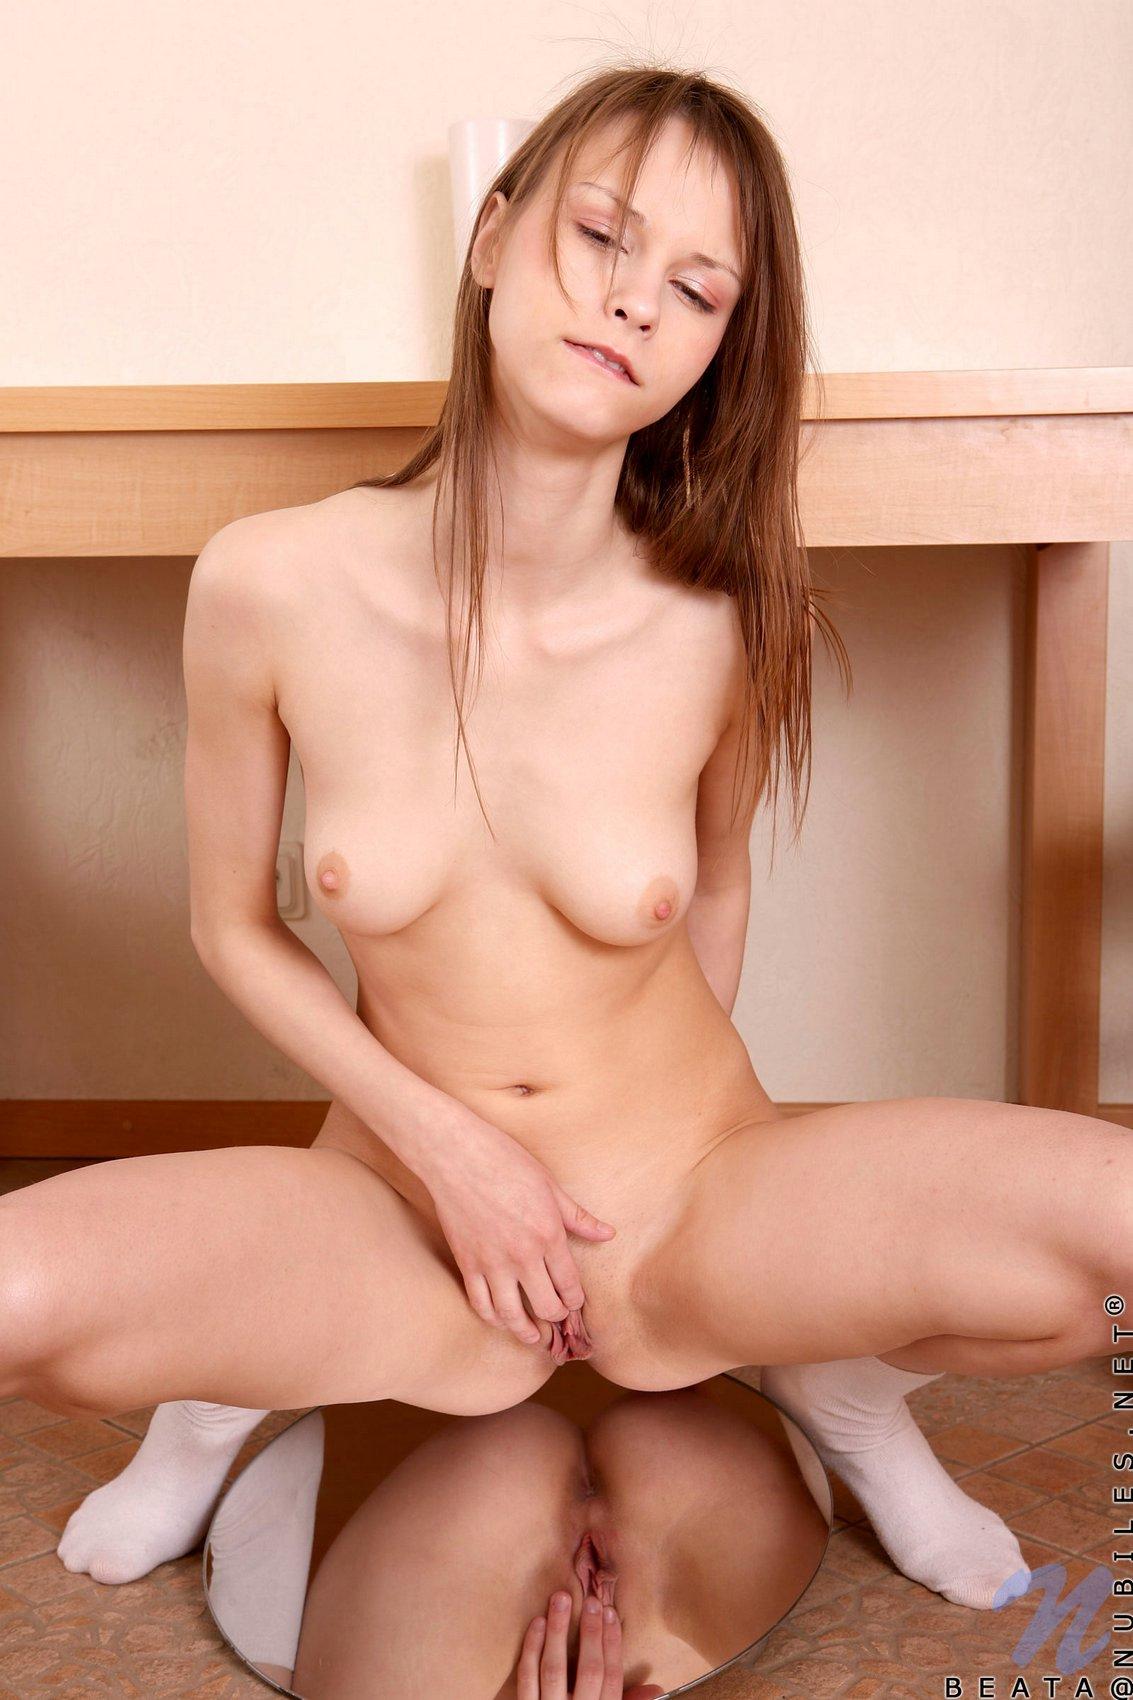 Beata porn галерея